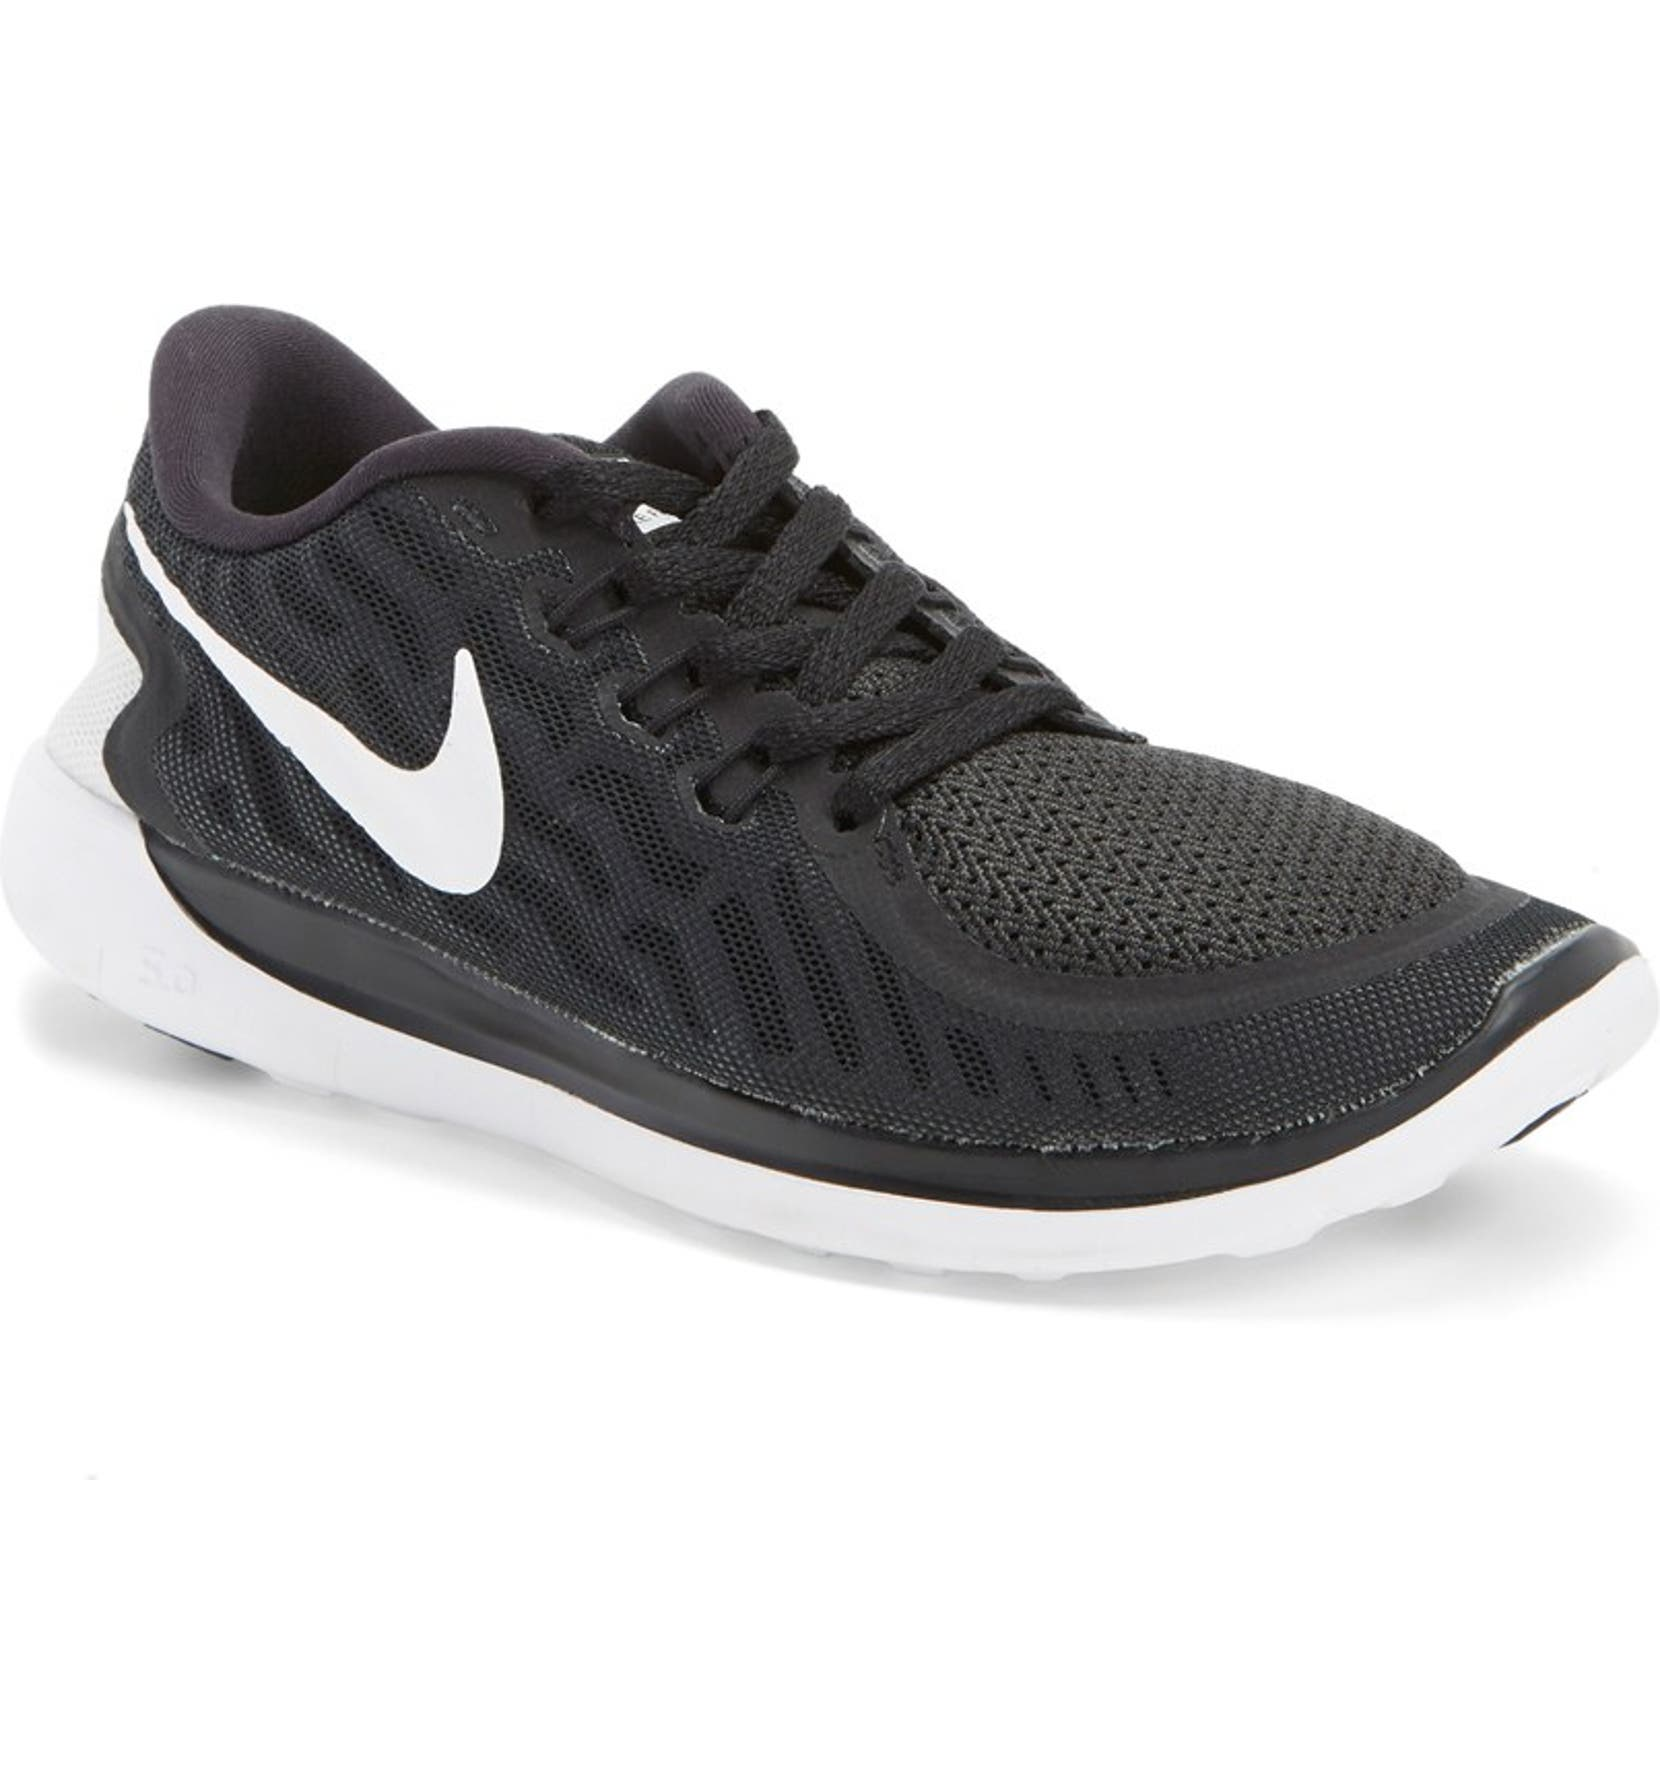 7b672667a937 Nike  Free 5.0  Running Shoe (Big Kid)